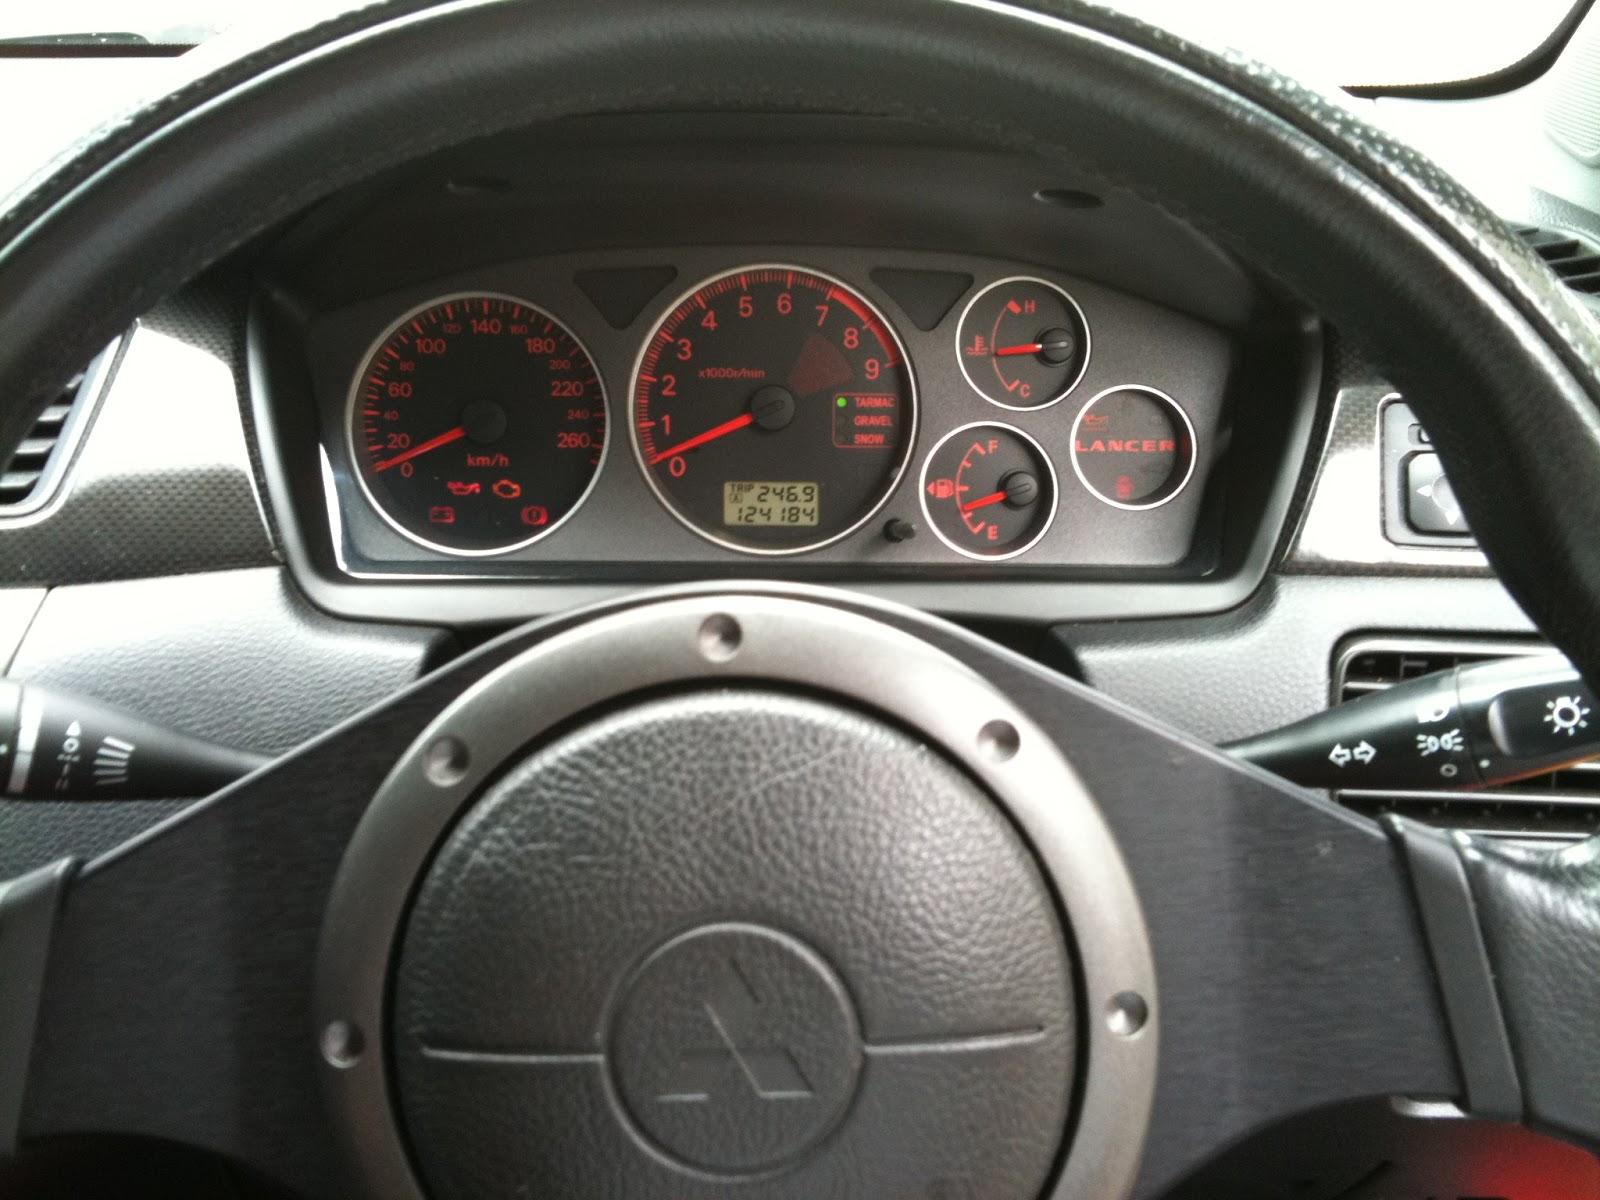 Insight Motorsports: Flex Fuel Testing on Mitsubishi Evo 9